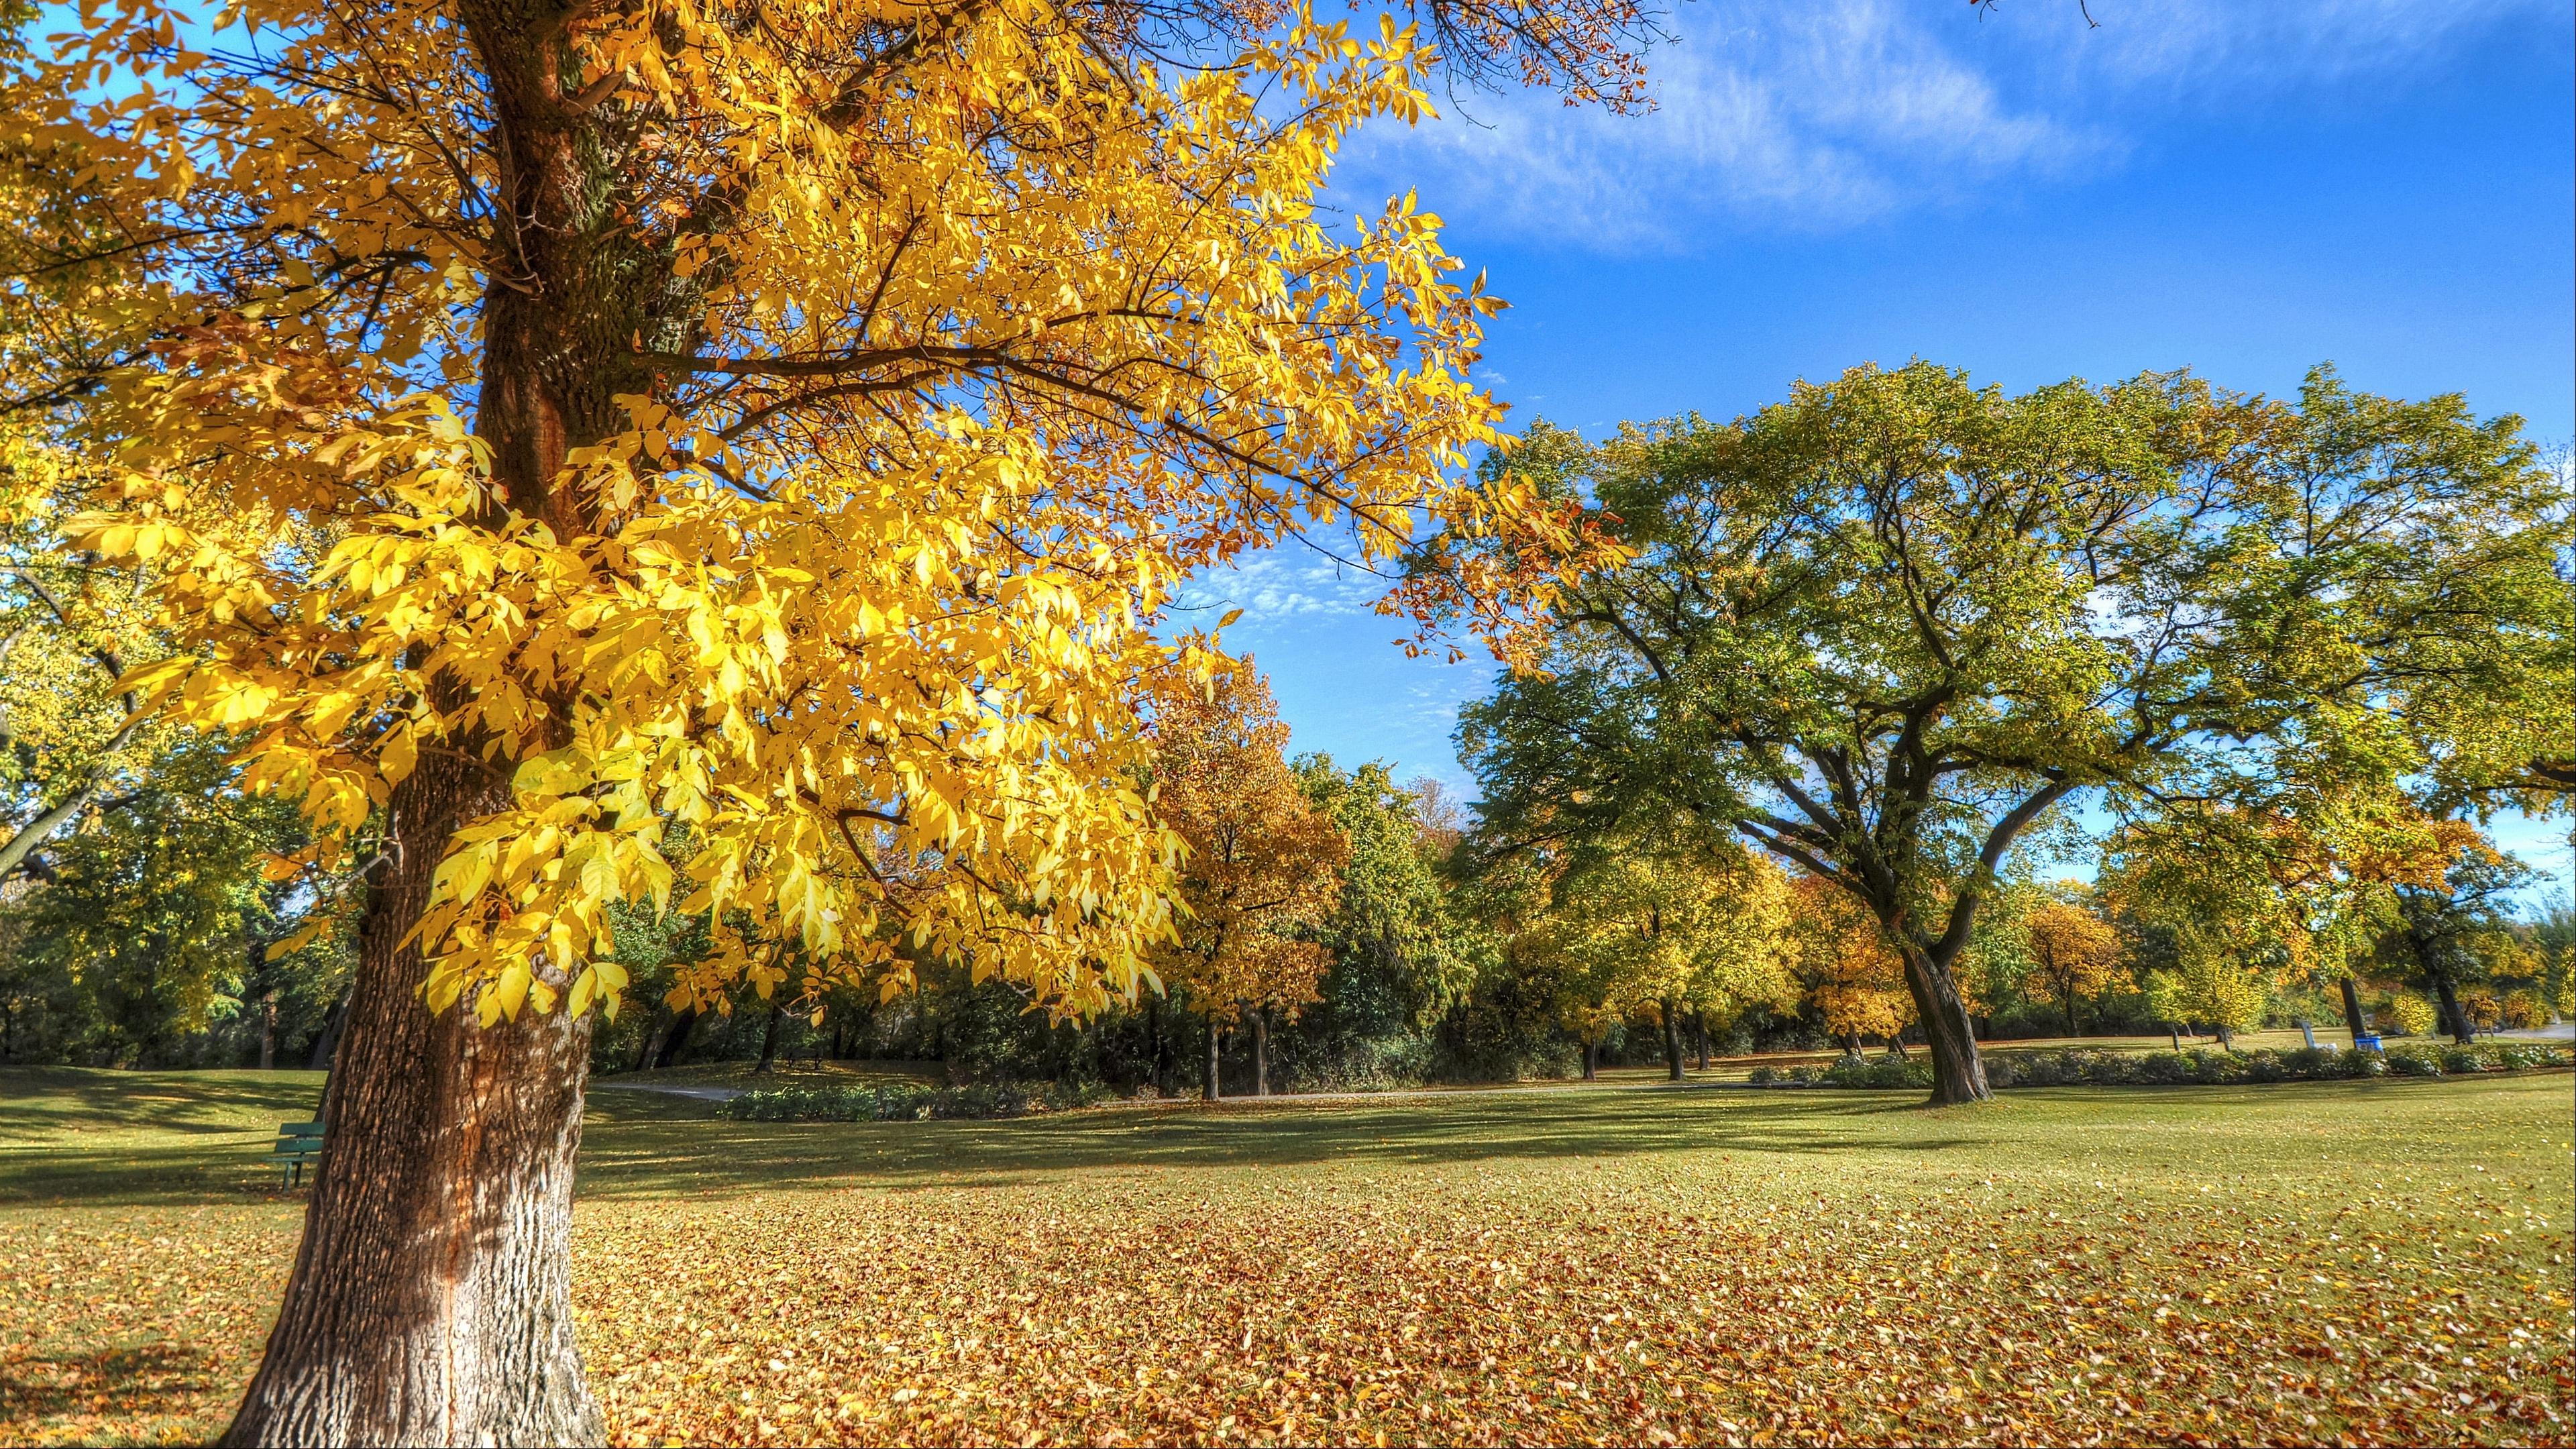 park autumn trees foliage 4k 1541114006 - park, autumn, trees, foliage 4k - Trees, Park, Autumn